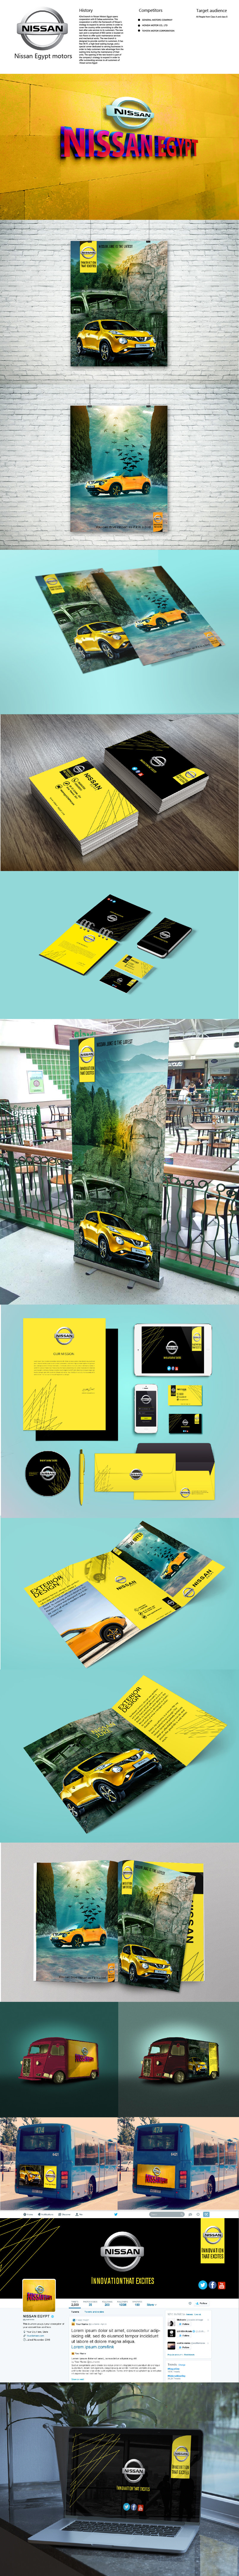 Branding -Nissan Compaign